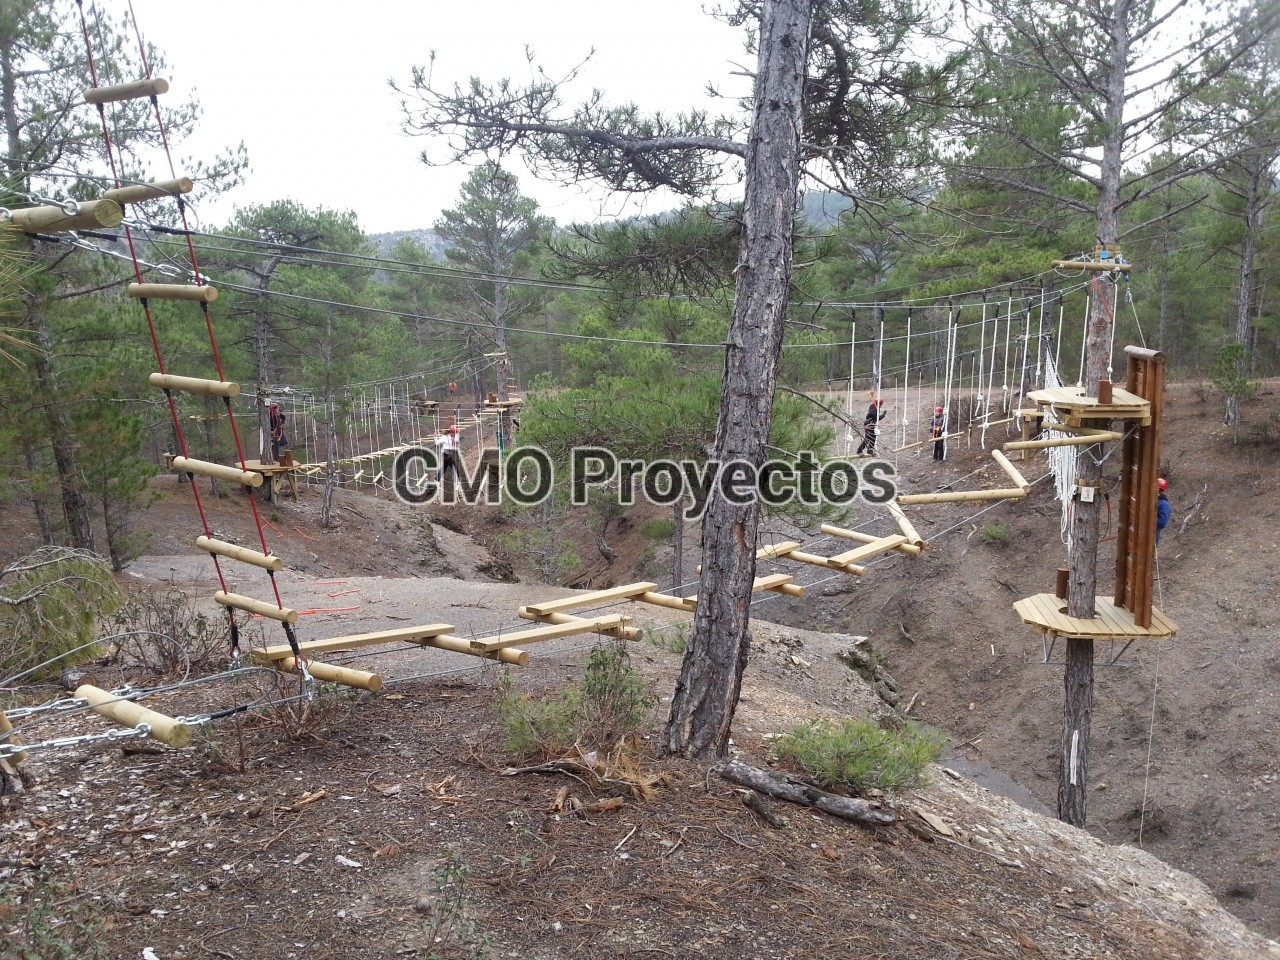 Circuitos en árboles con sistema bulón en Parque Multiaventura CMO Proyectos